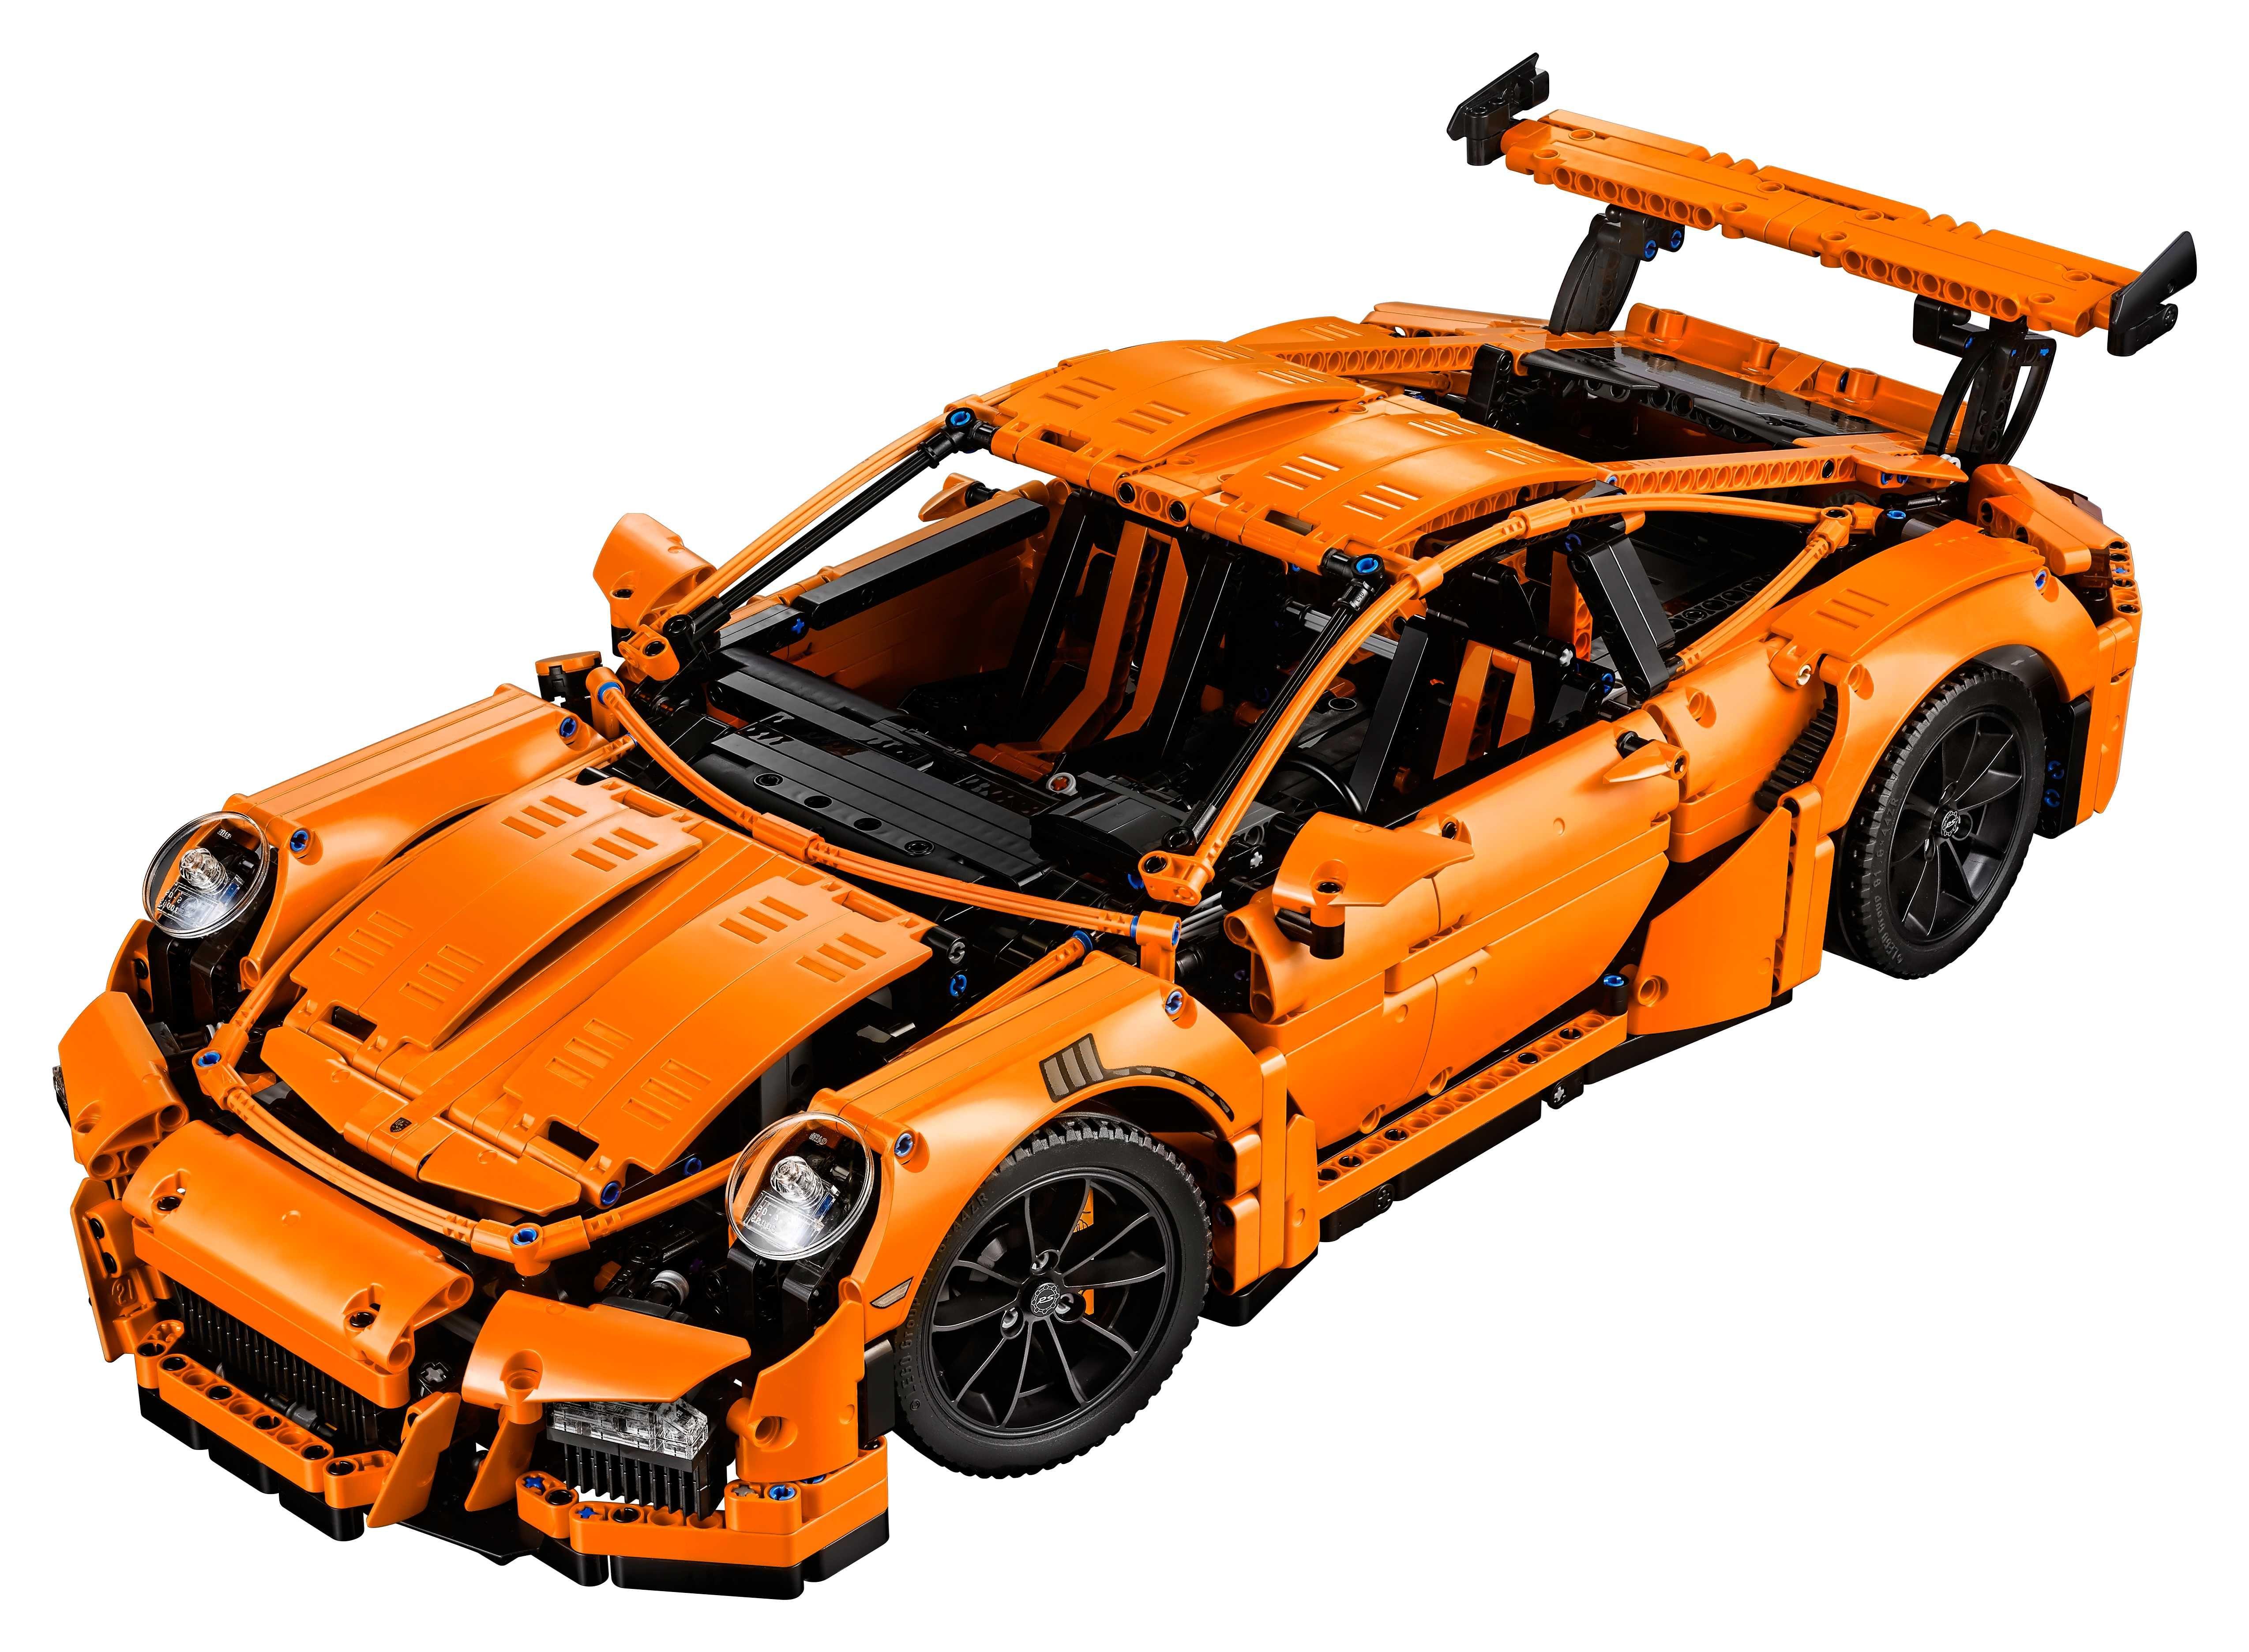 LEGO Technic Porsche Lego technic, Rennwagen, Lego